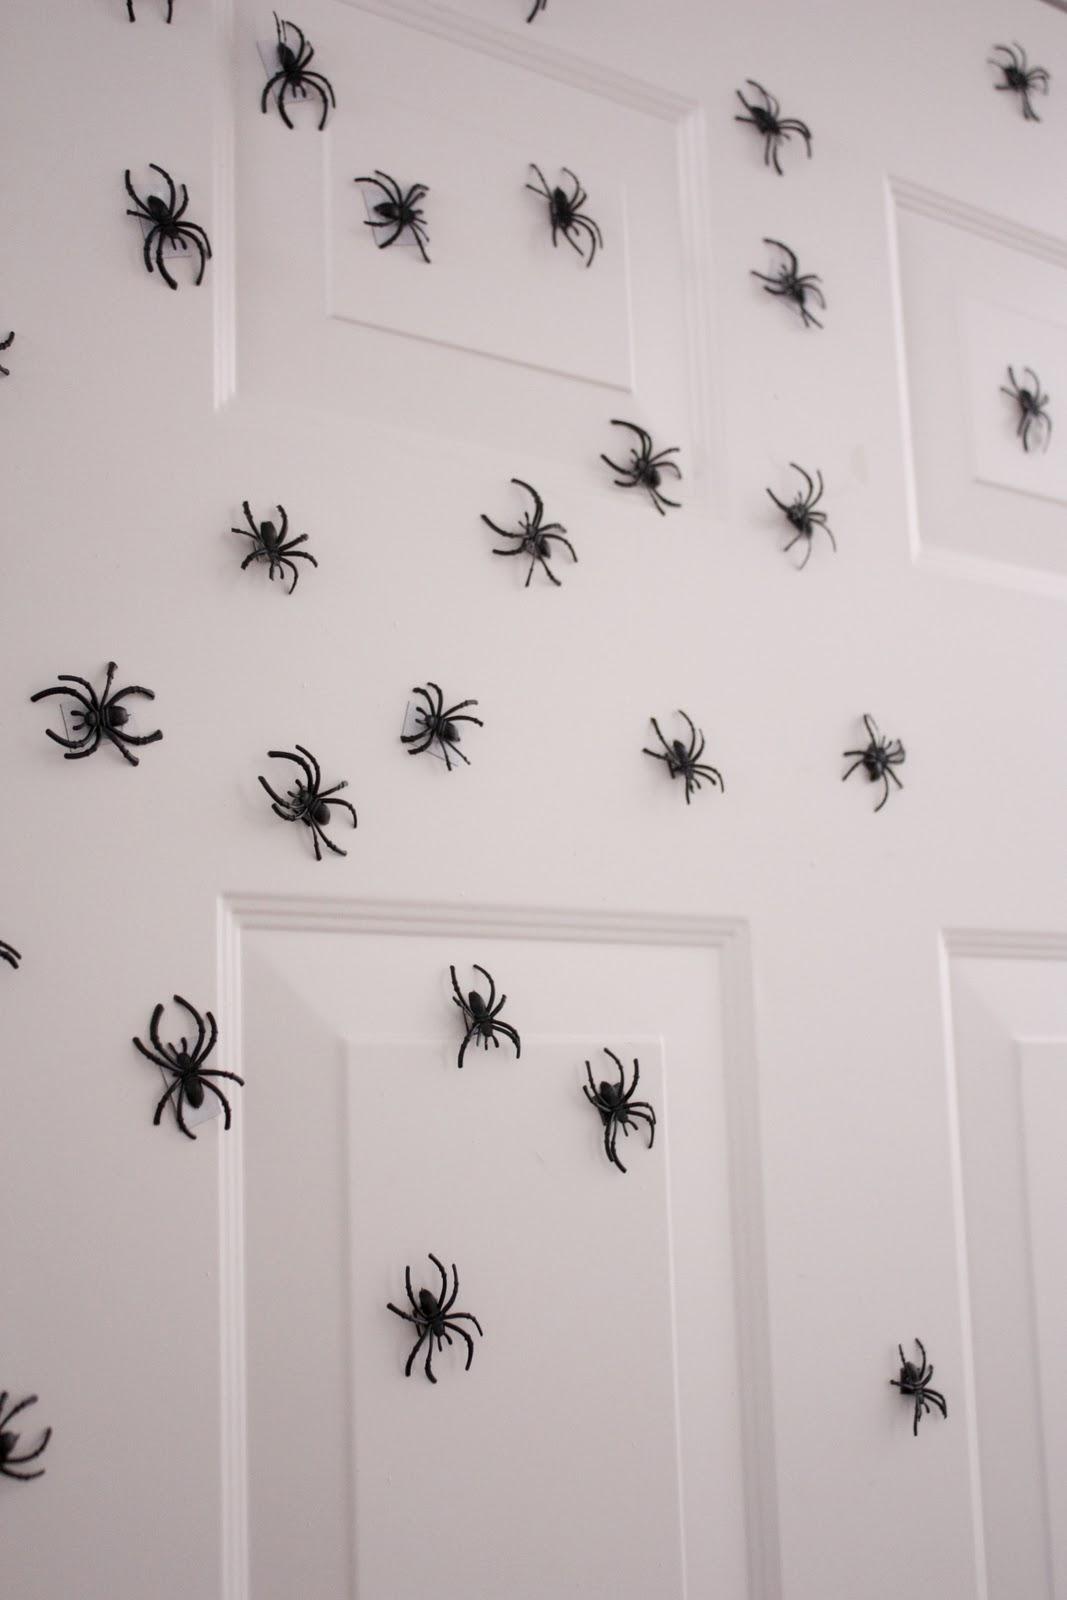 Super Spiders Invade